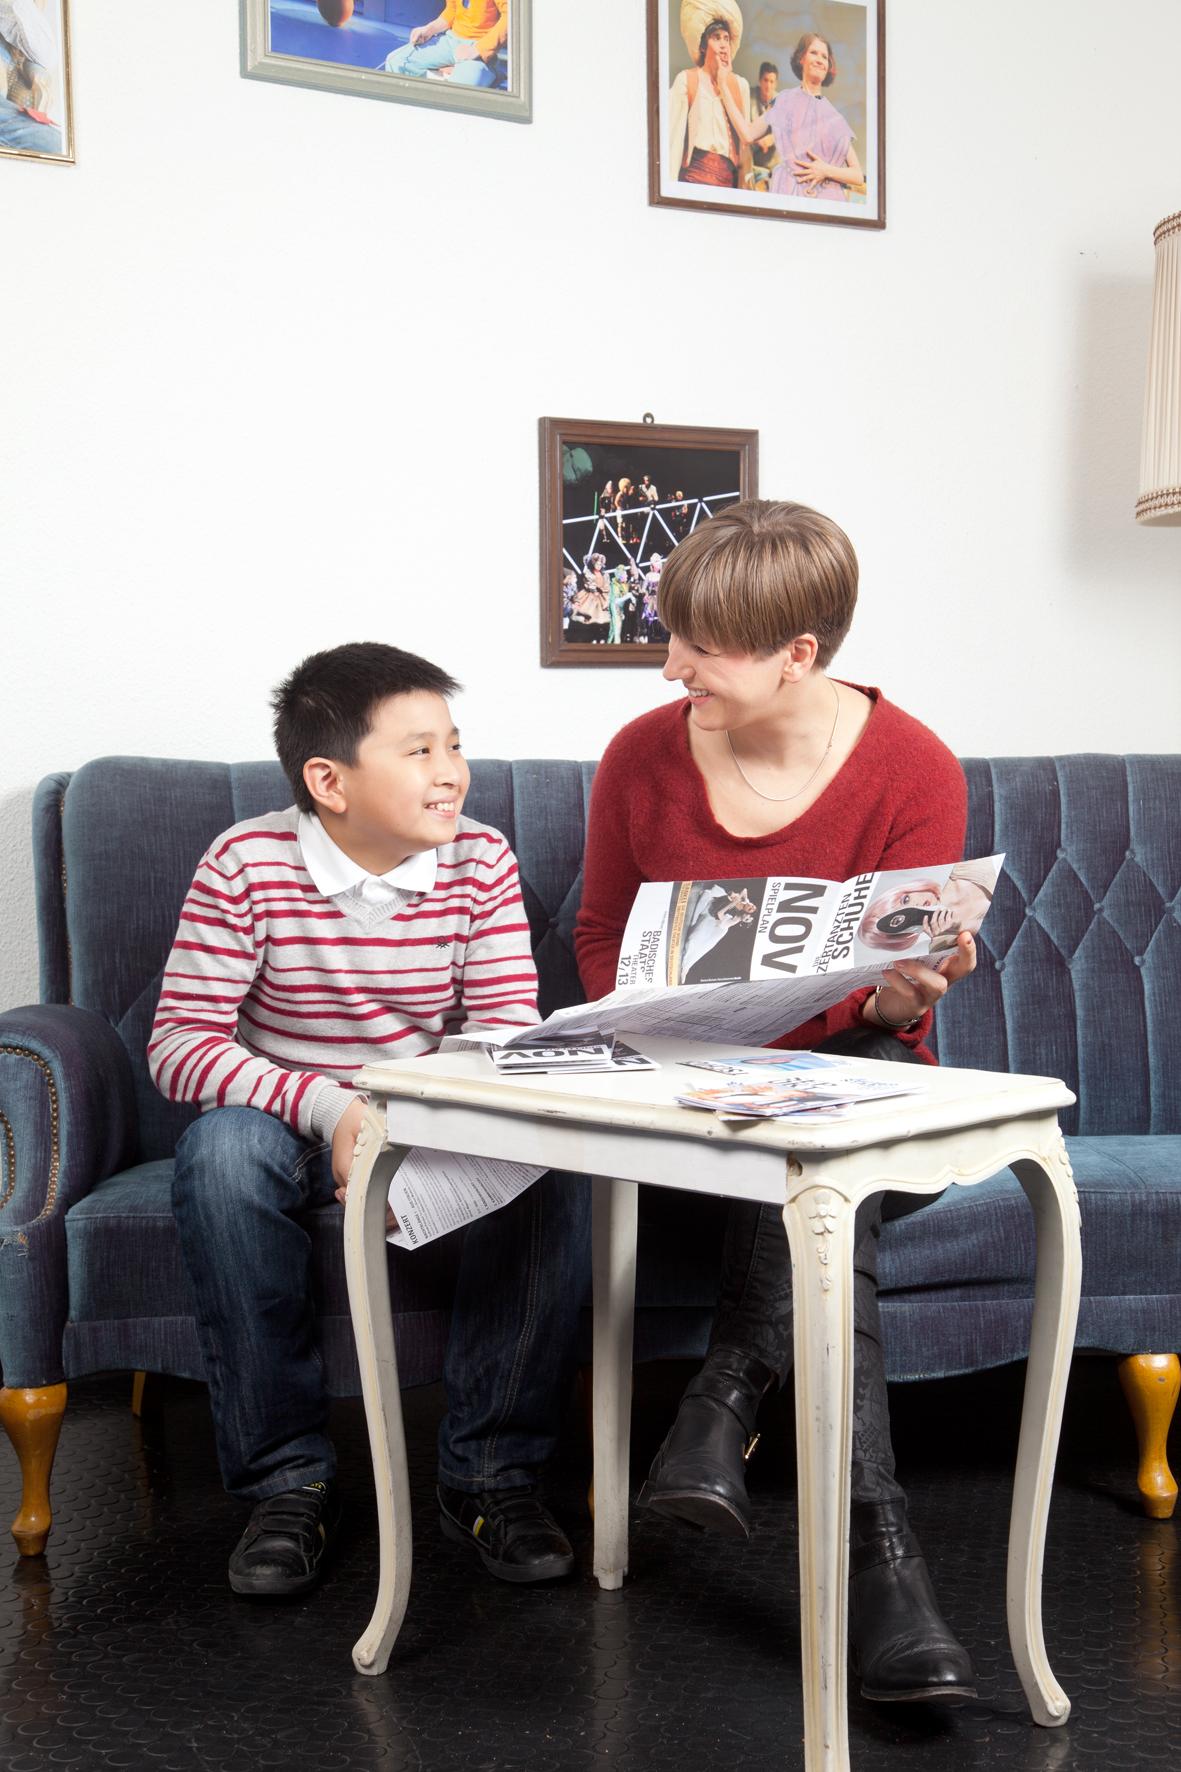 Kultulotsin mit einem Kind